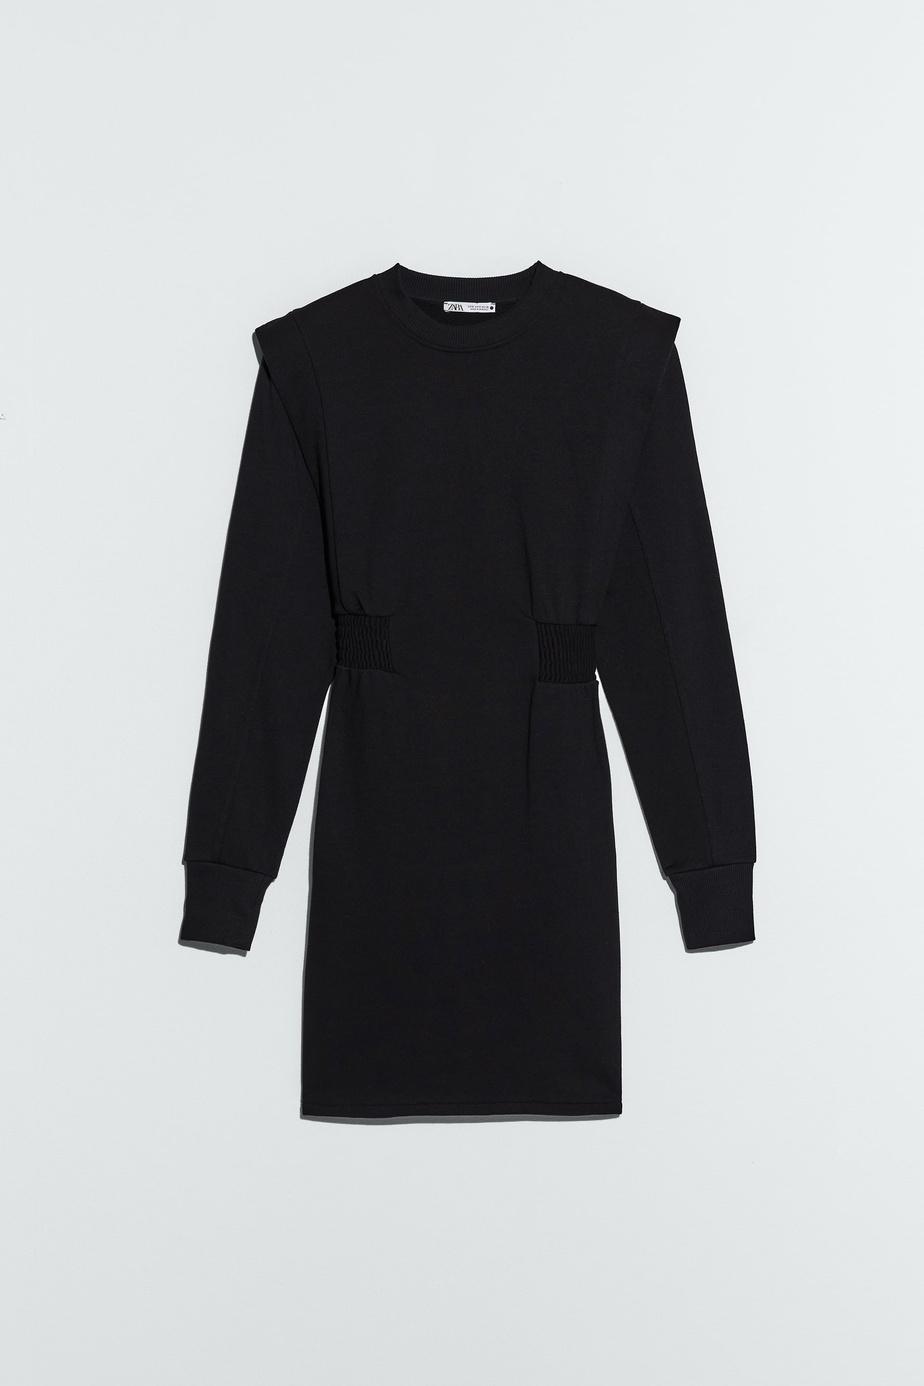 Robe courte à col enV, avec manches longues, Zara, 49,90$.